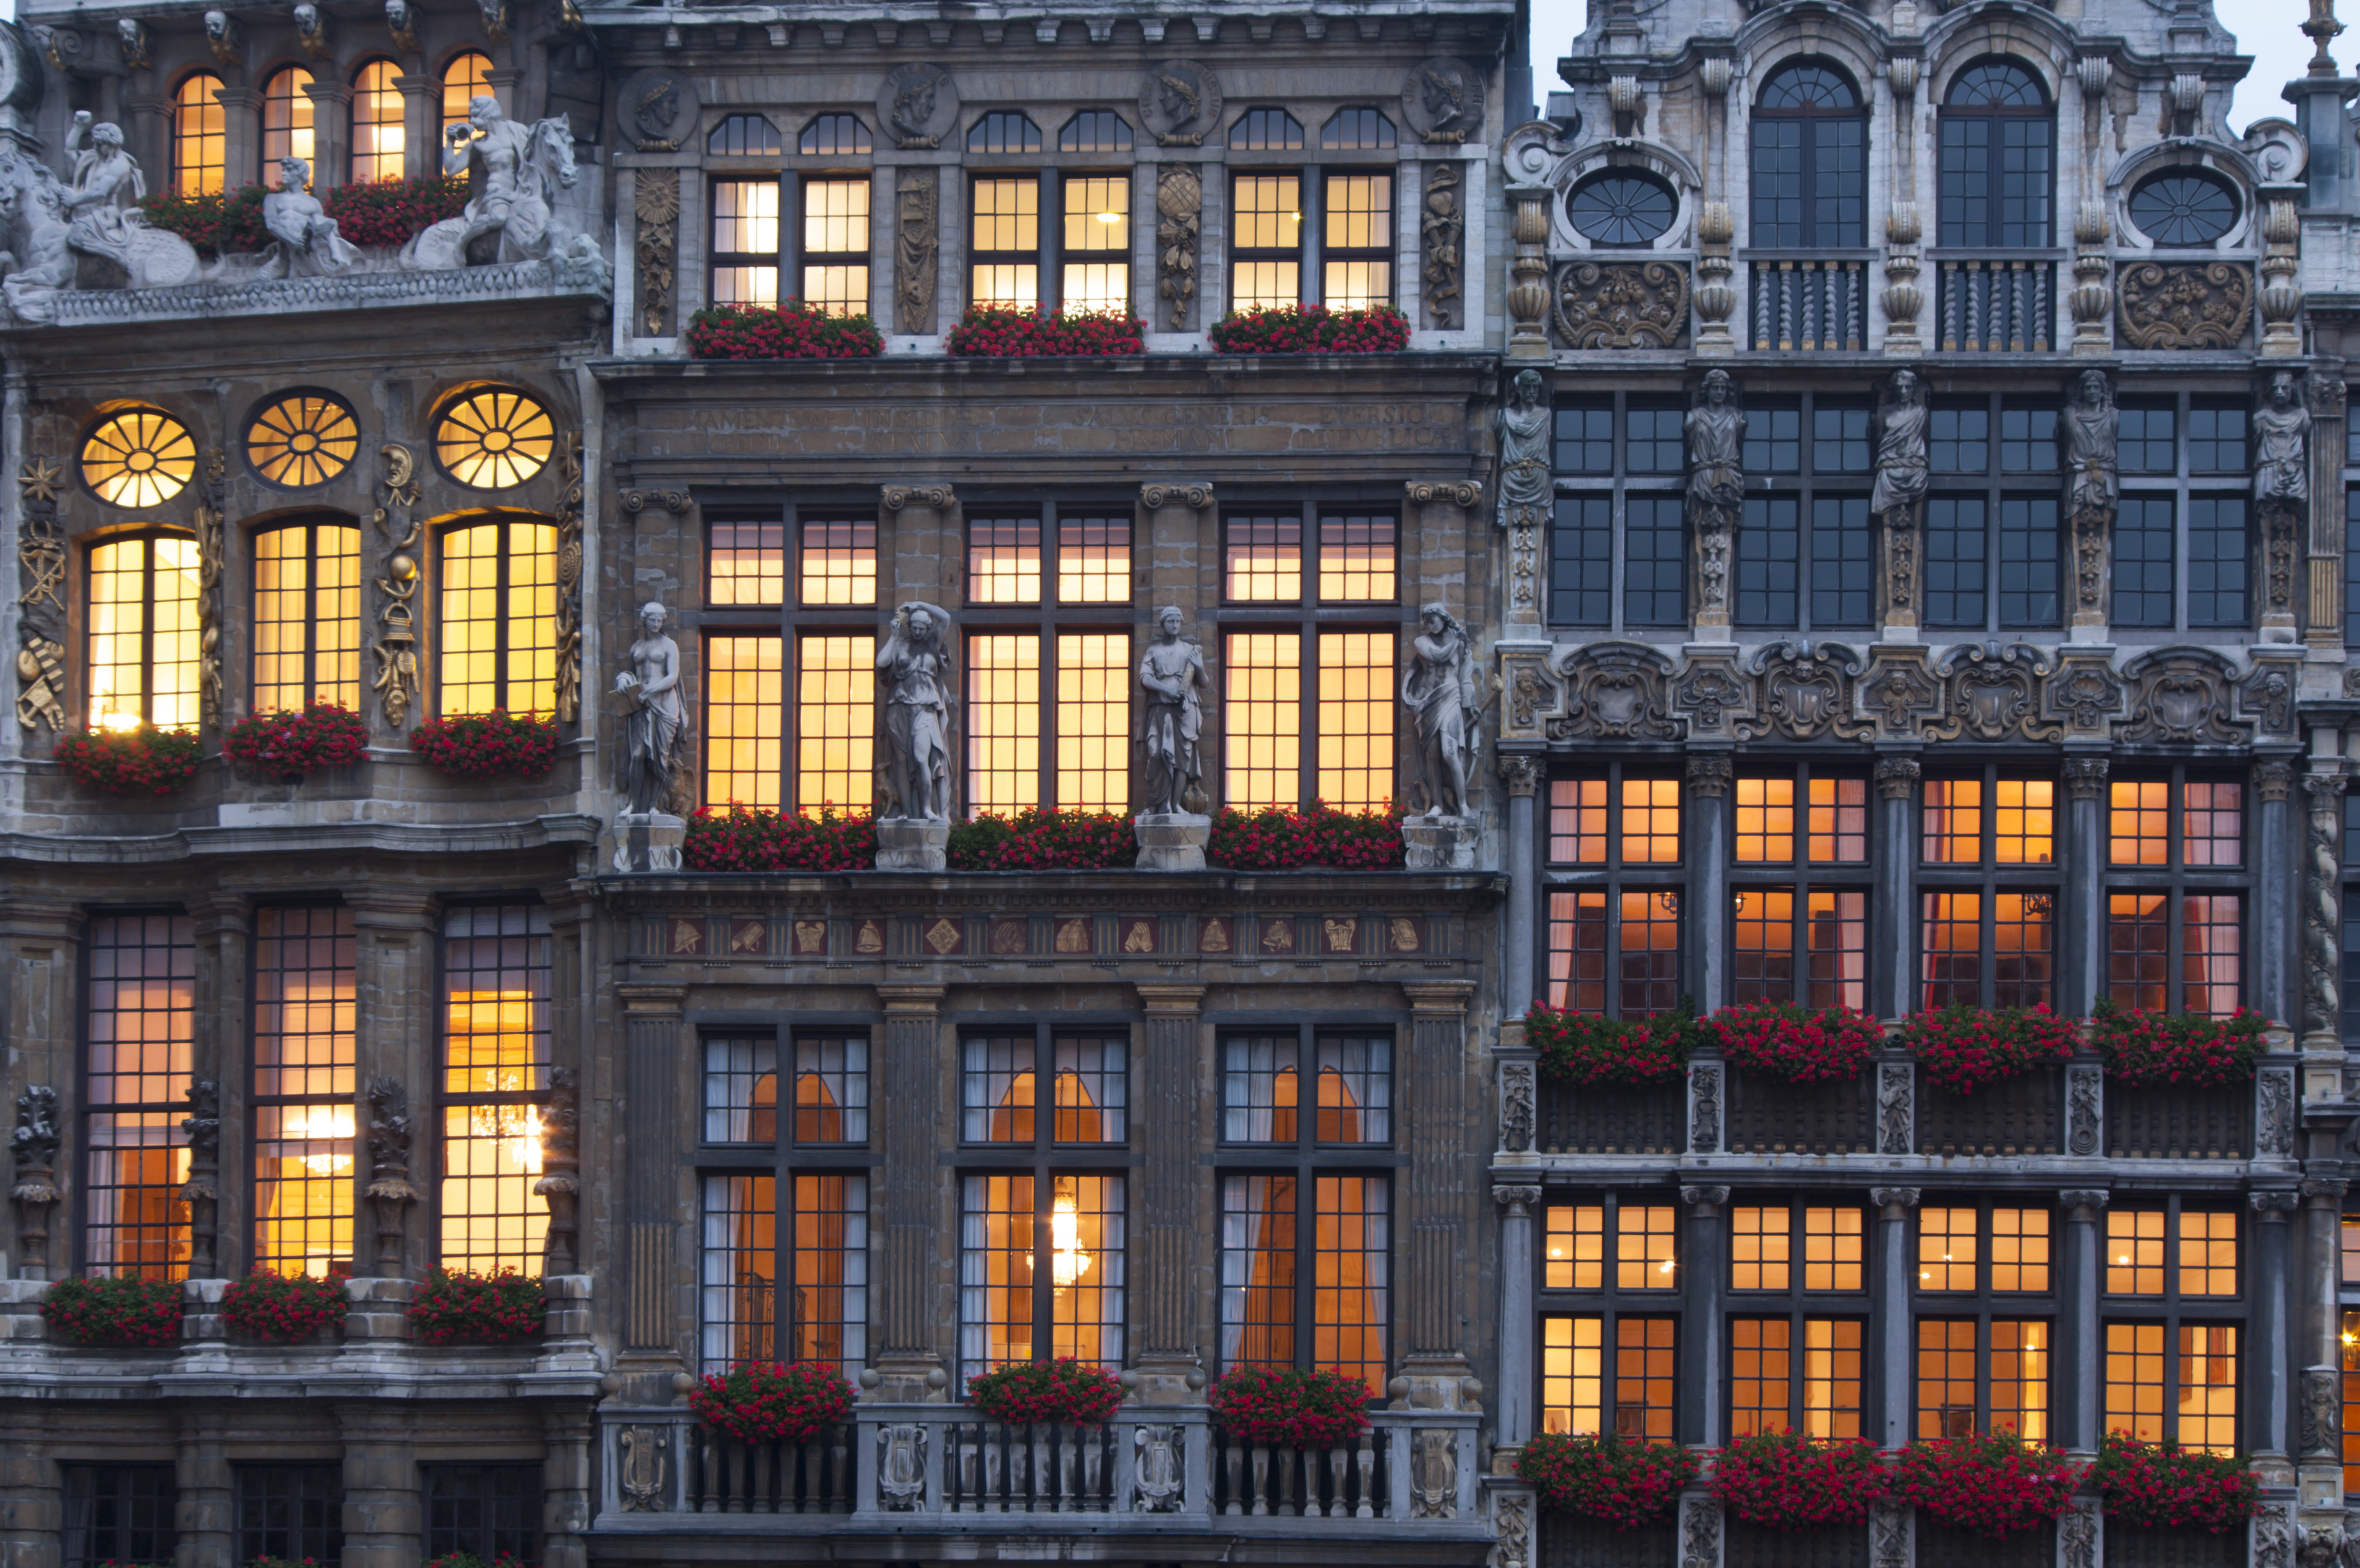 Windows Of Building In La Grand Place Brussels Belgium 5k